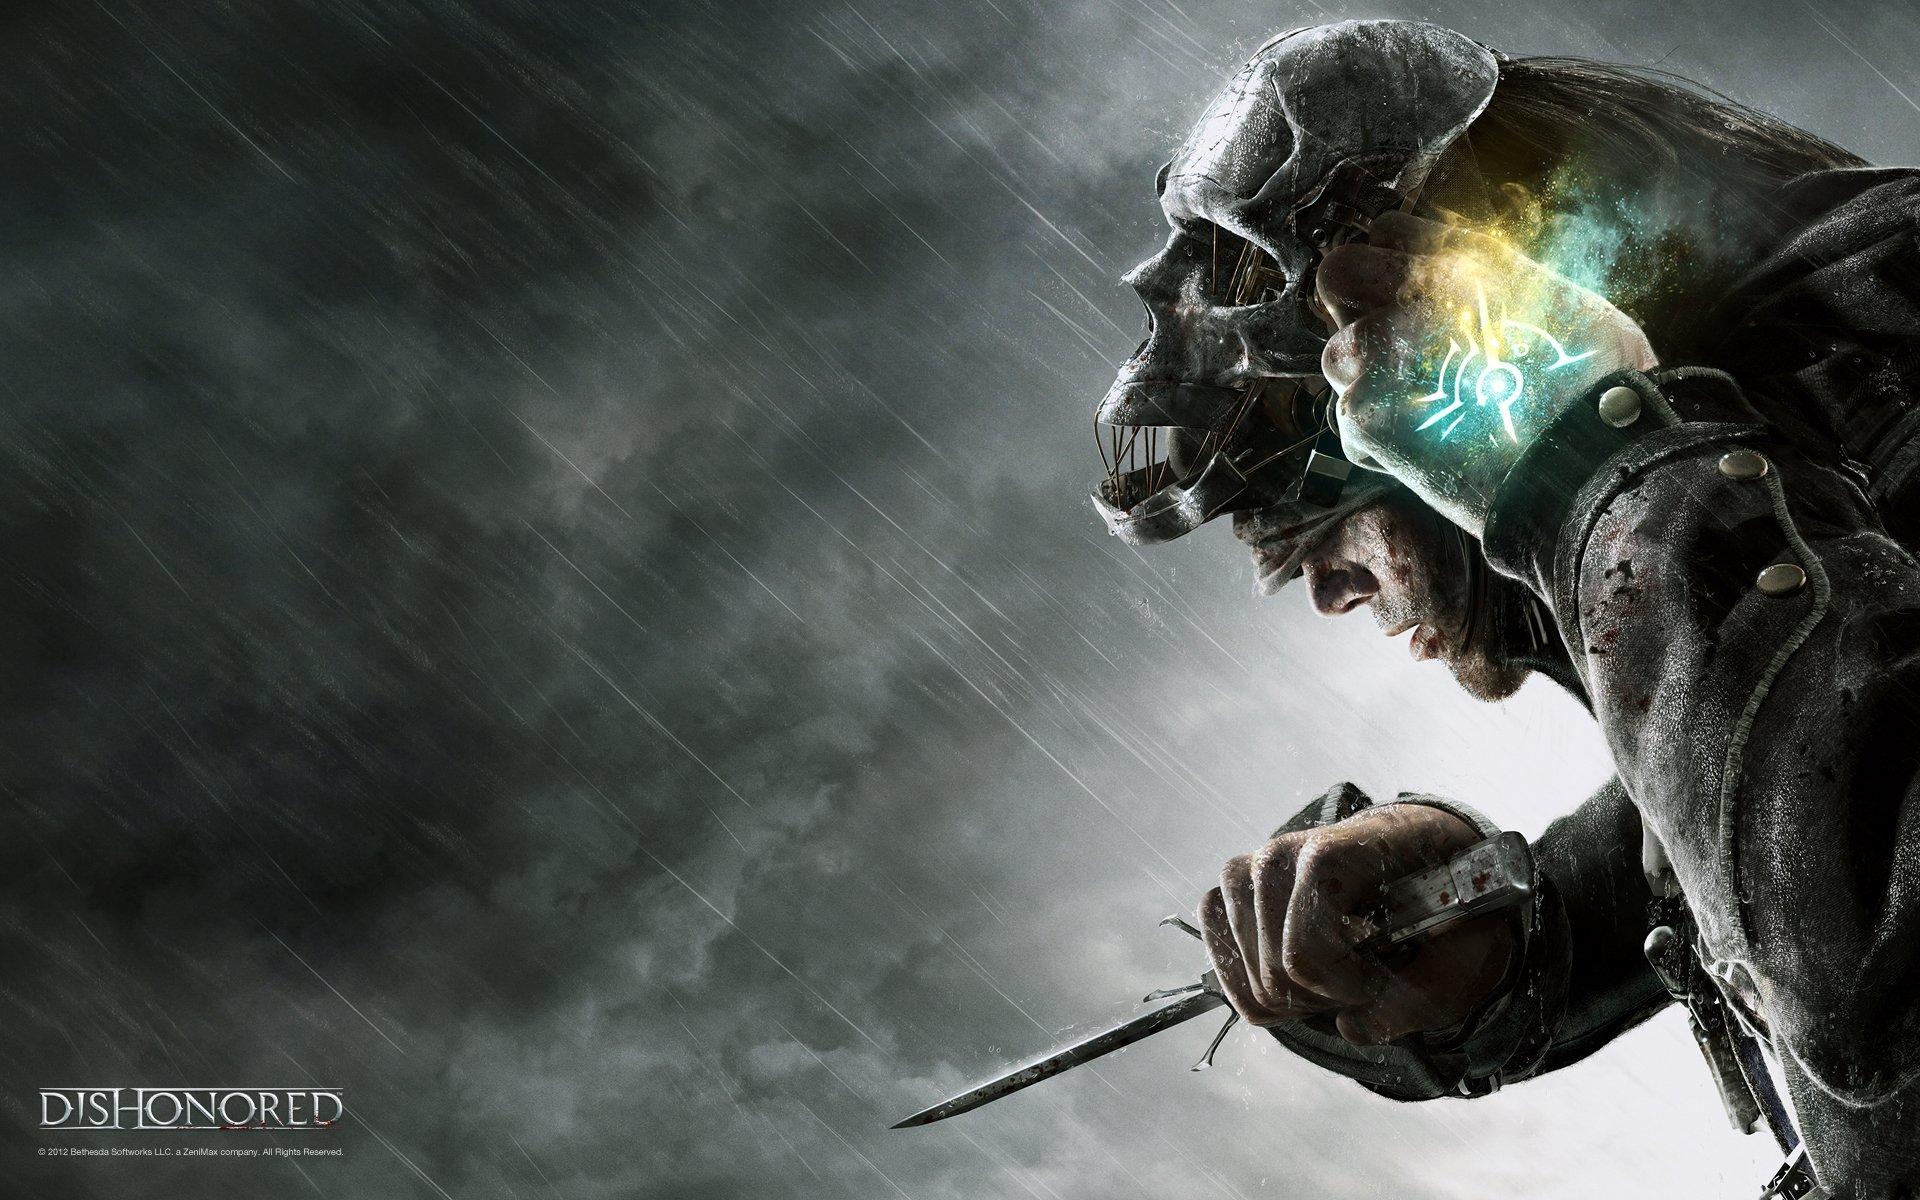 ... готовят сюжетное DLC - Изображение 1: kanobu.ru/news/dlya-dishonored-gotovyat-syuzhetnoe-dlc-365151